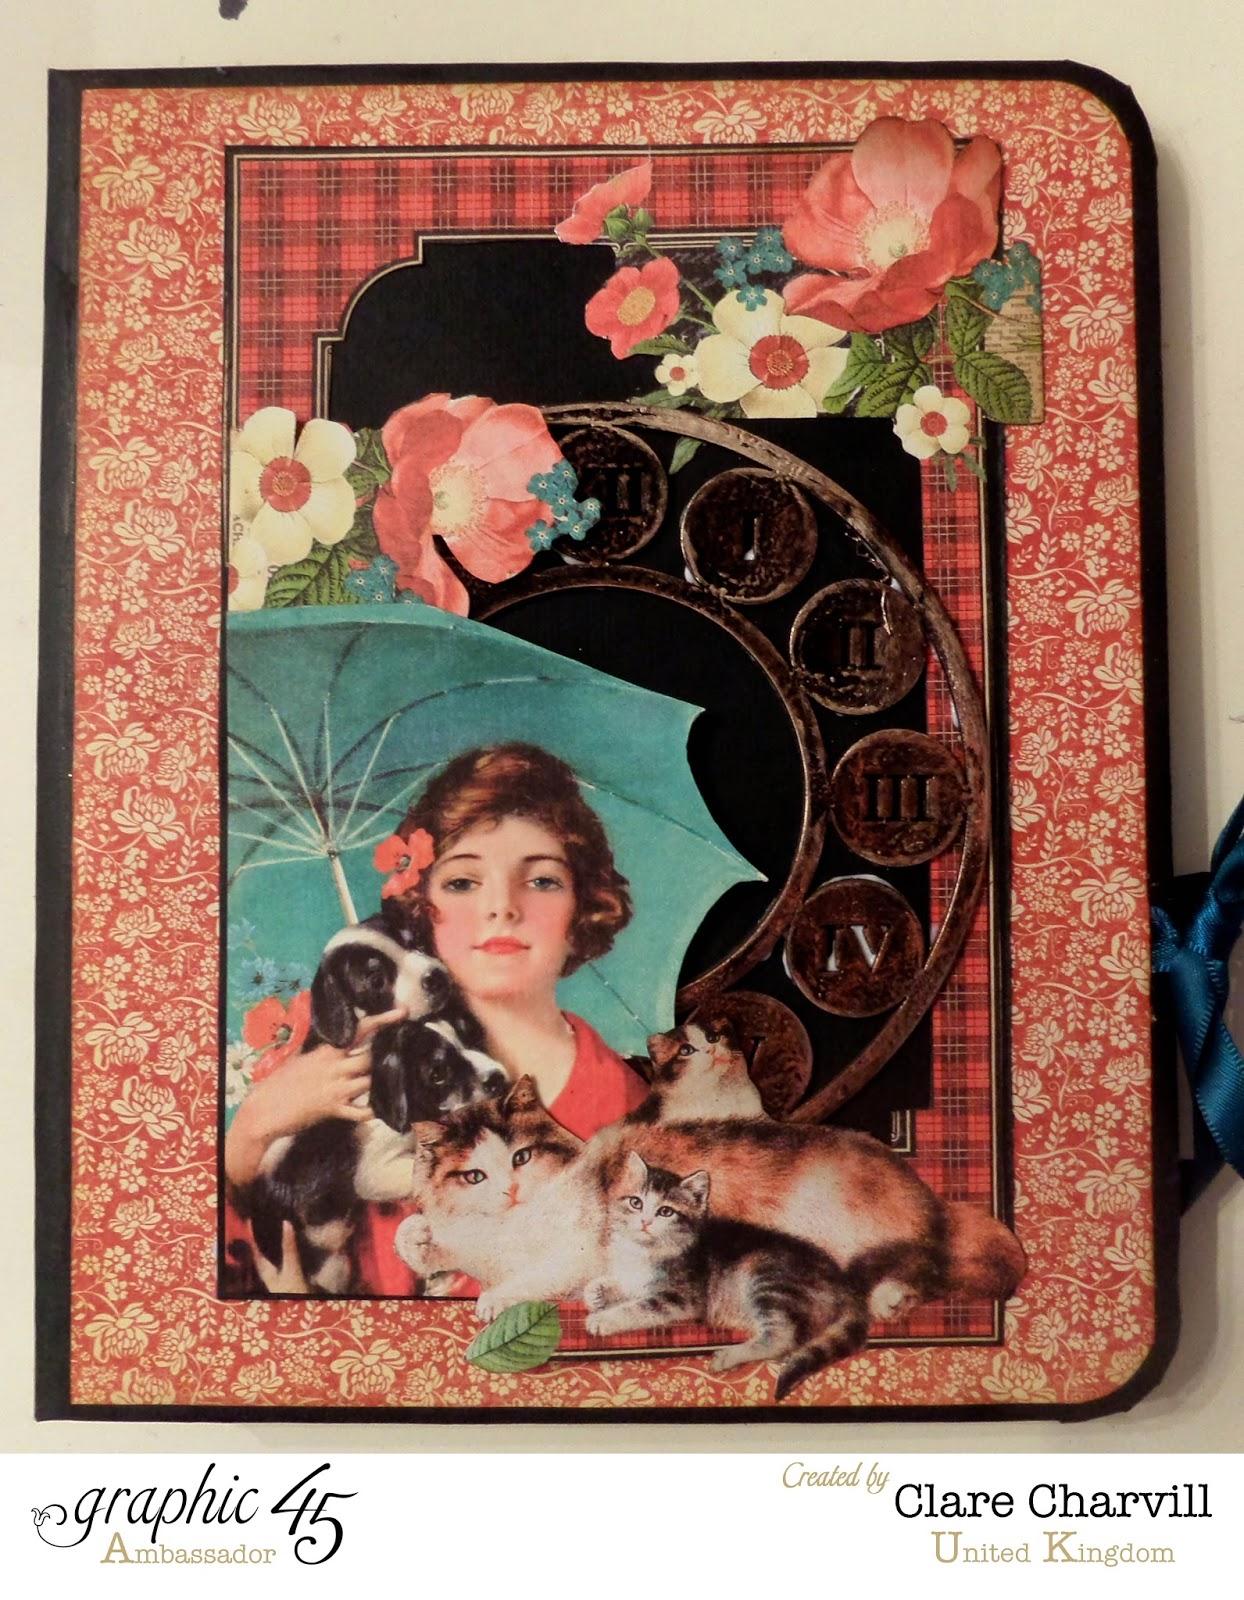 Raining Cats and Dogs Folio Album designed by Clare Charvill Graphic 45 Ambassador UK